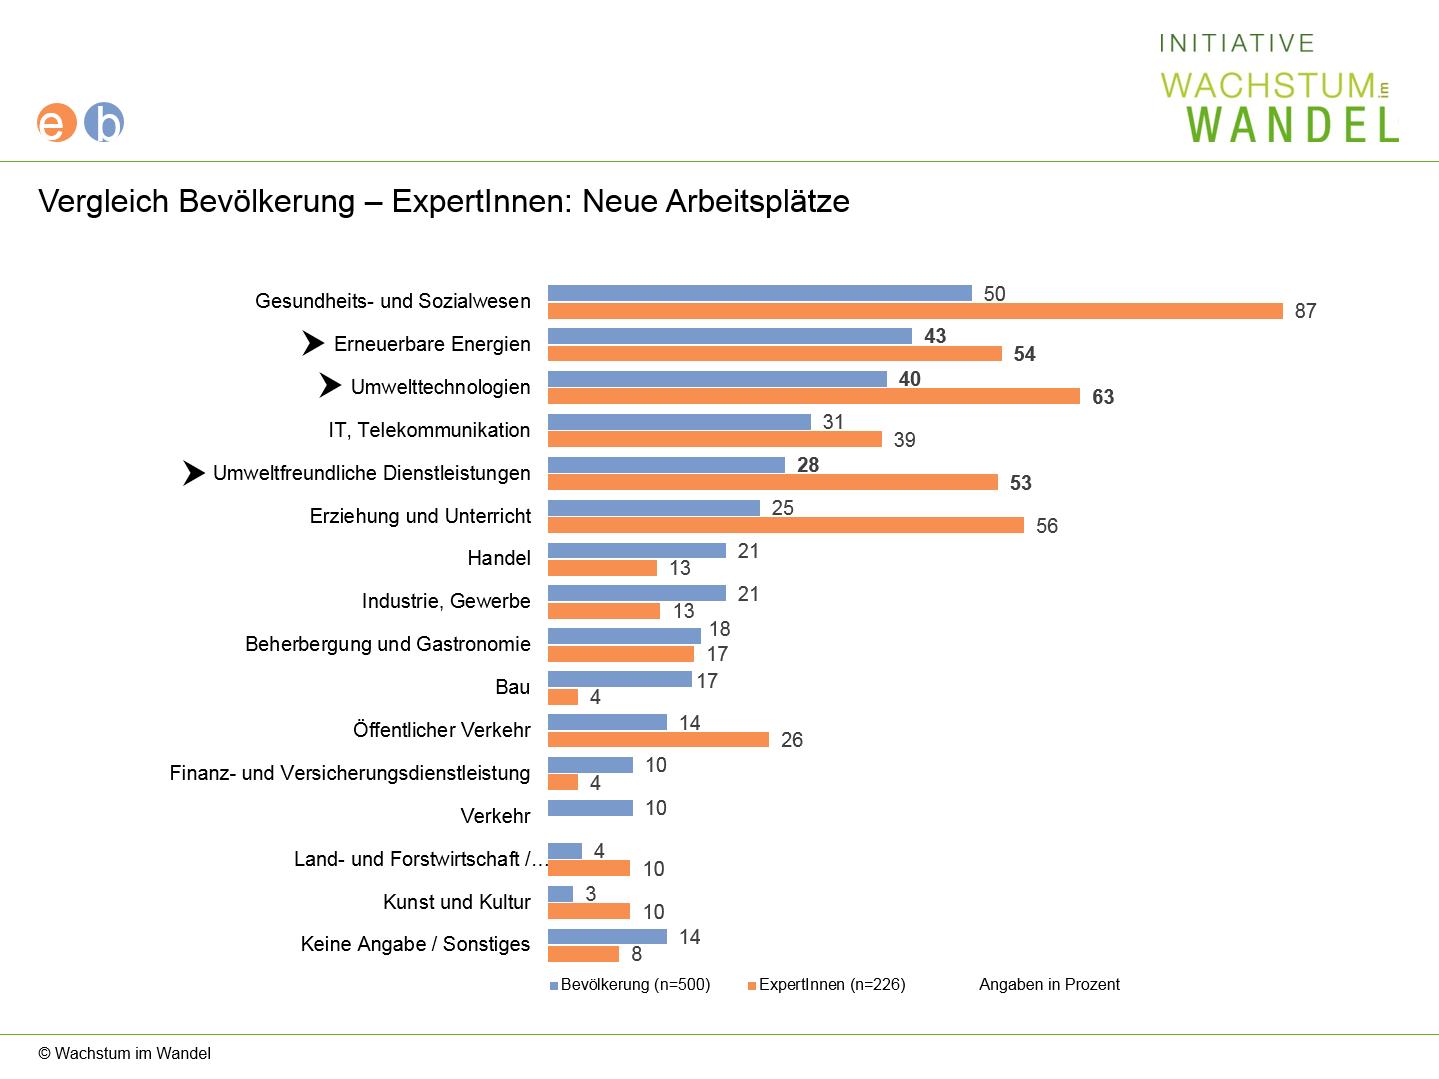 Diagramm: Vergleich Bevölkerung ExpertInnen: Meinung zur Schaffung neuer Arbeitsplätze